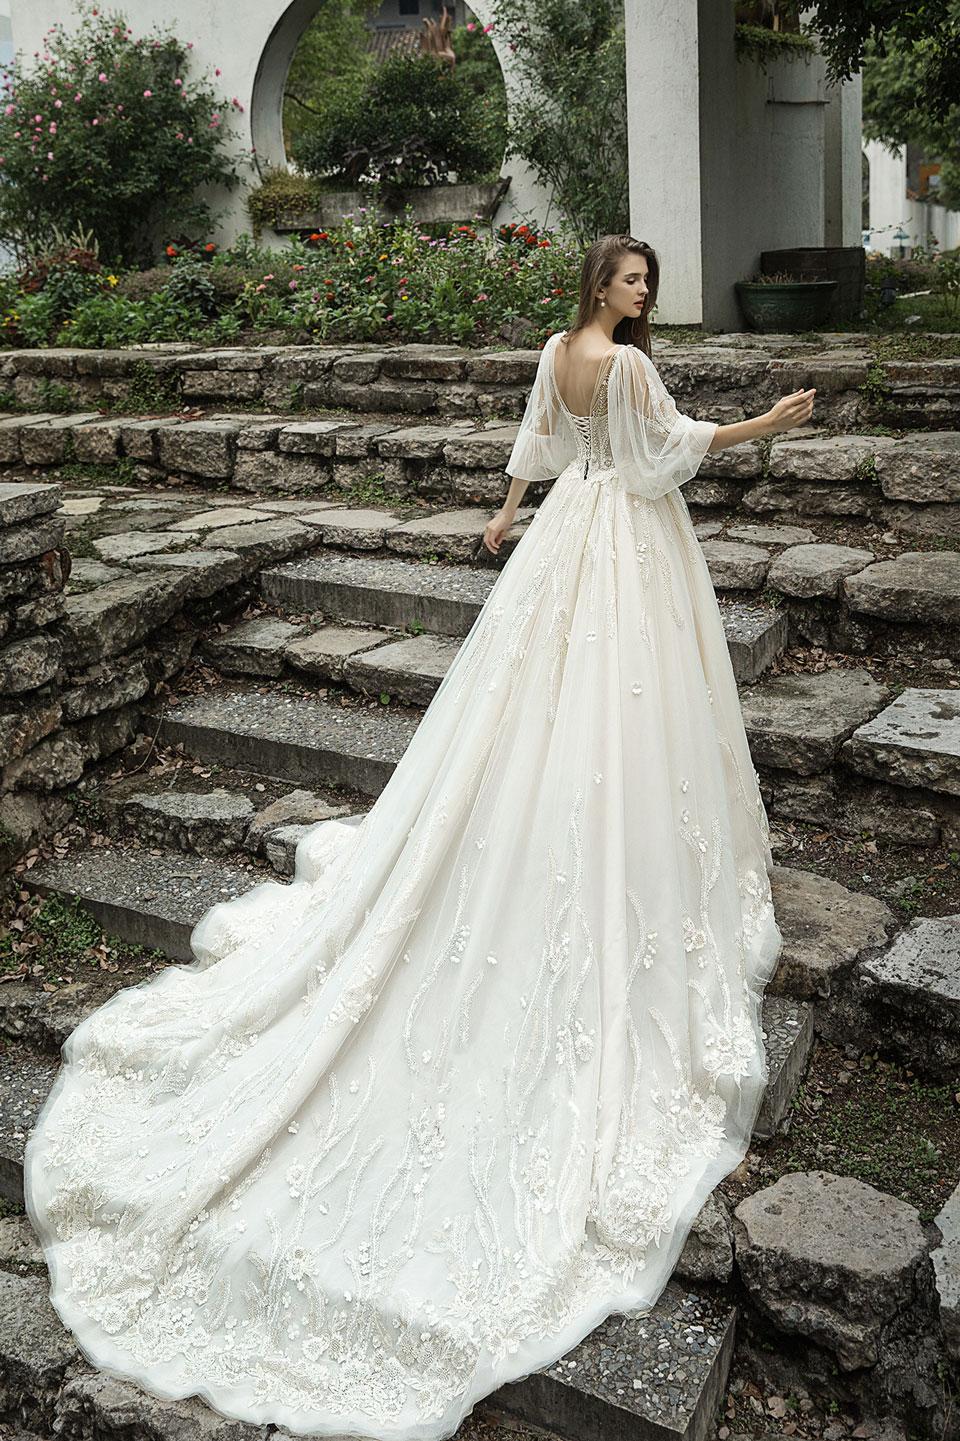 puff-sleeves-low-back-wedding-dress-train.jpg